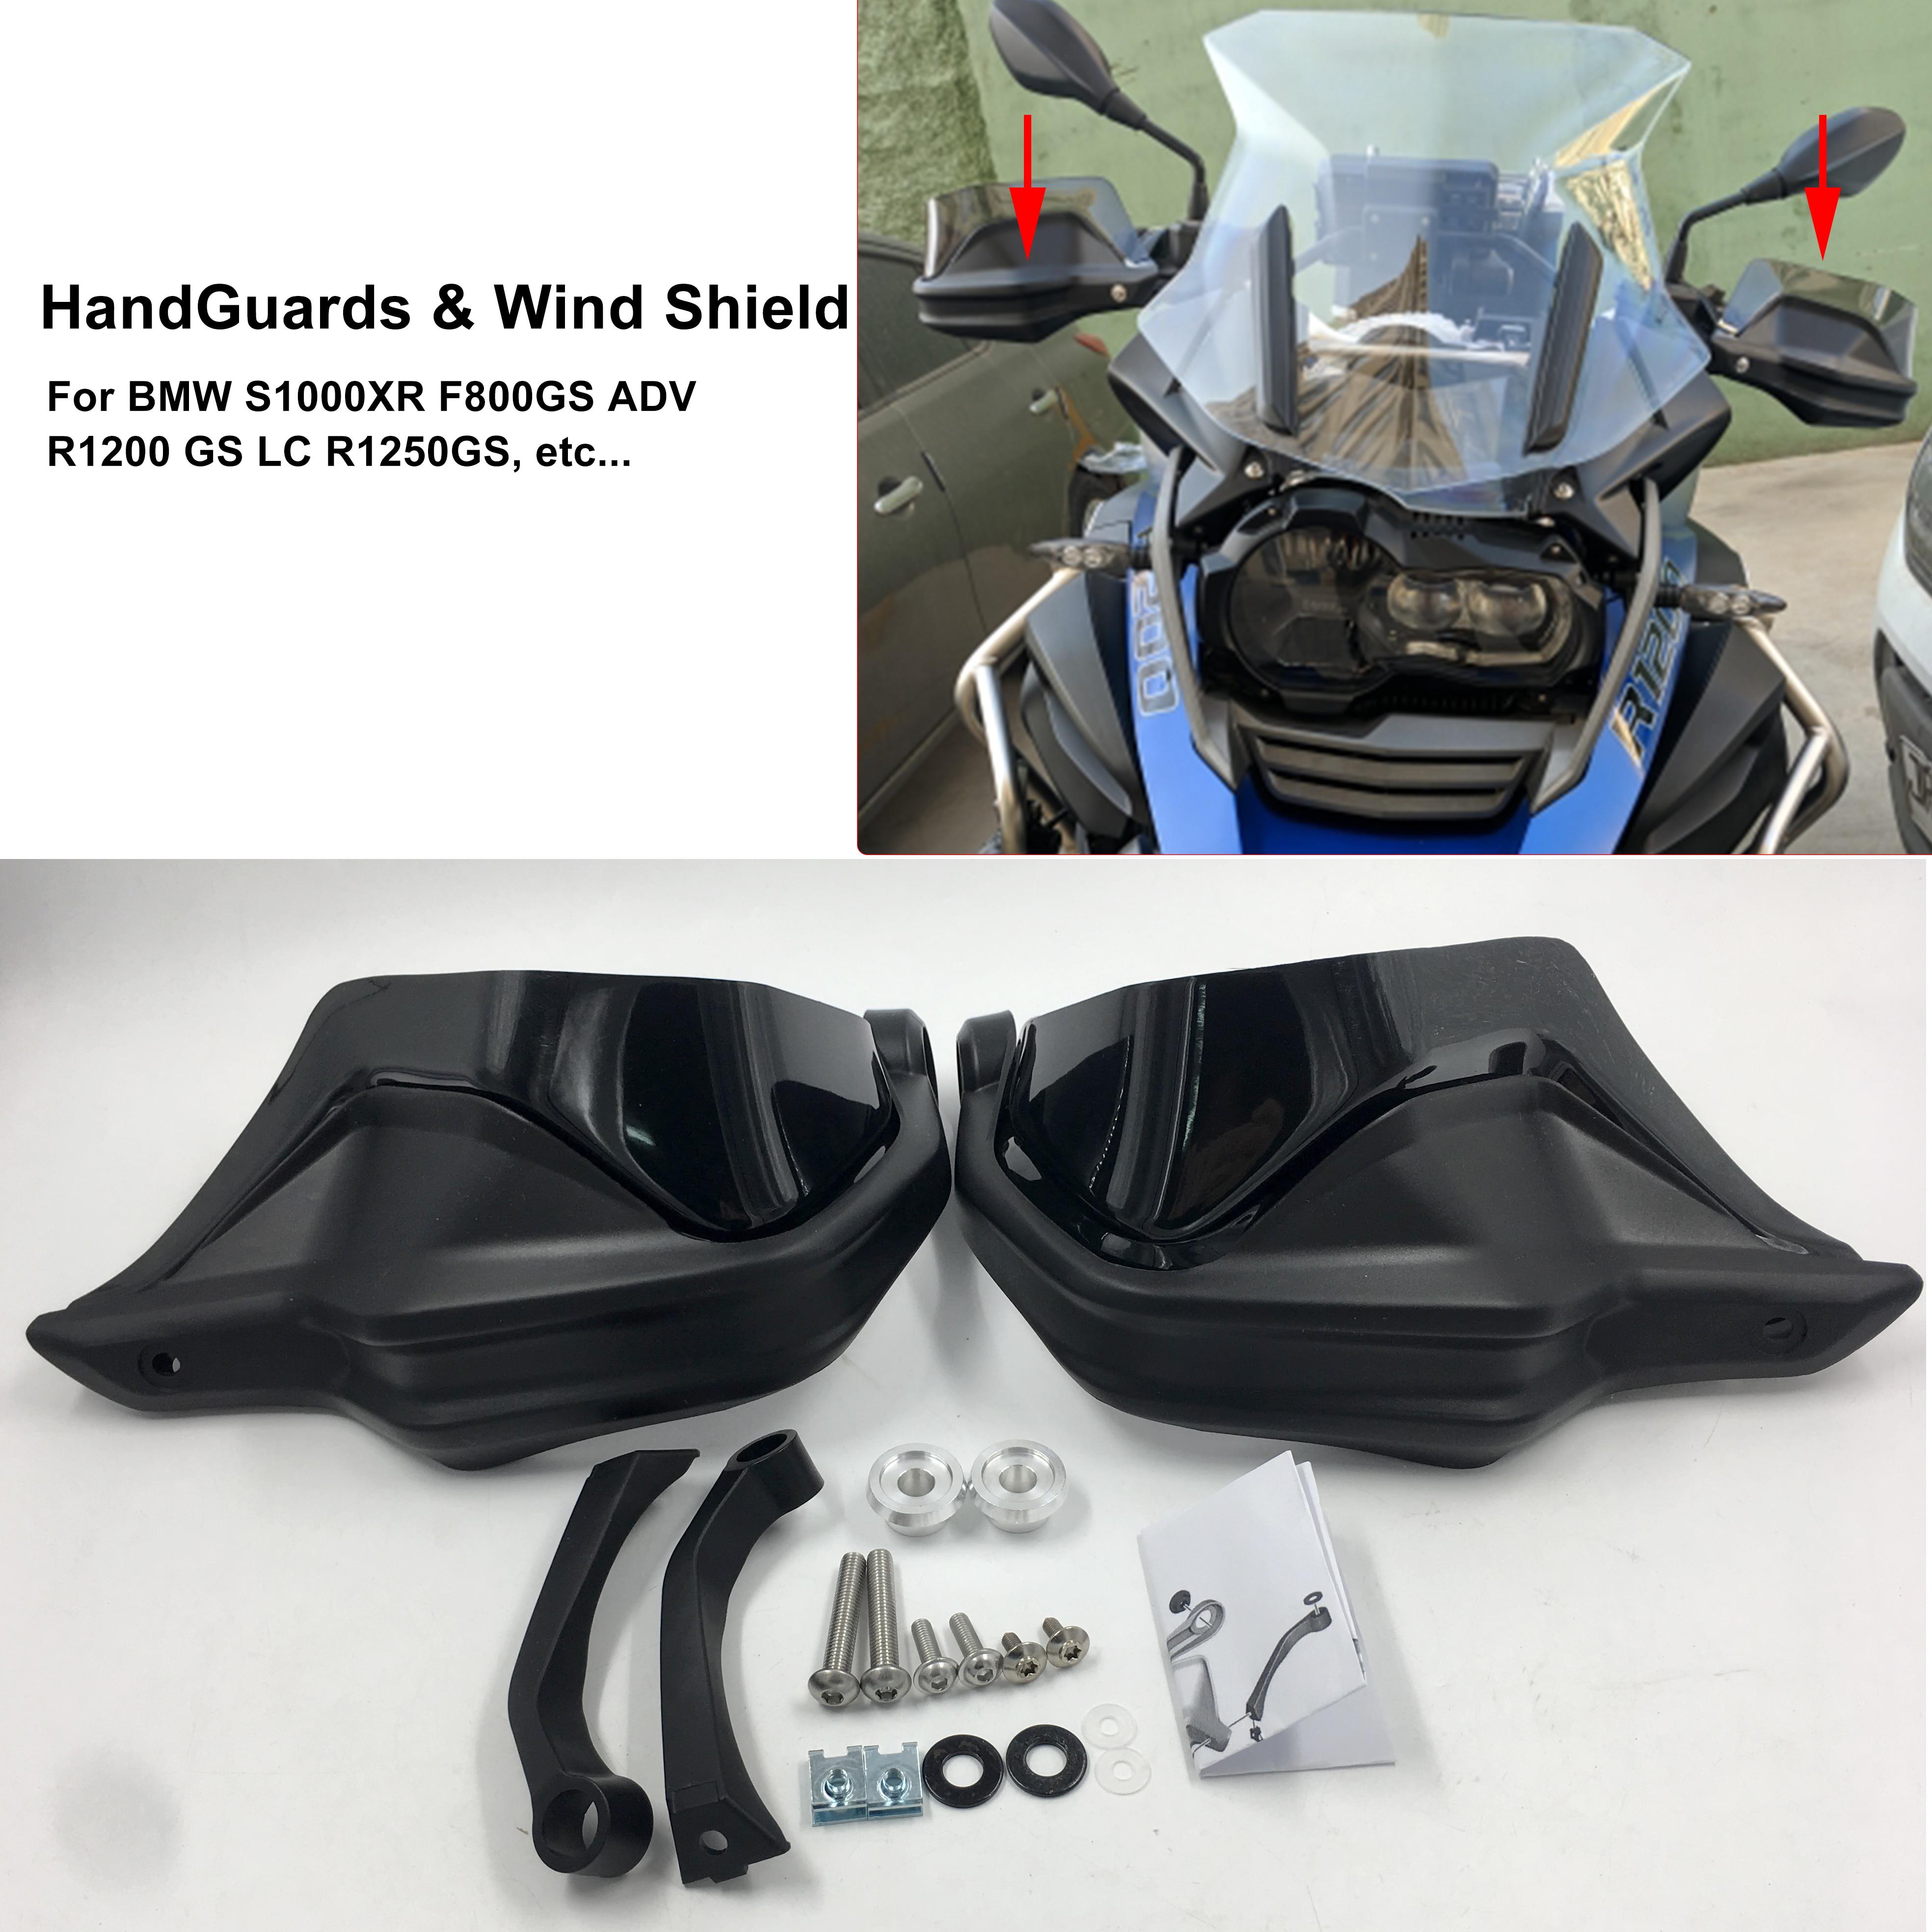 Full Set HandGuard Shield Hand Guards Windshield For BMW R 1200 GS ADV R1200GS LC F800GS Adventure S1000XR R1250GS F750GS F850GS